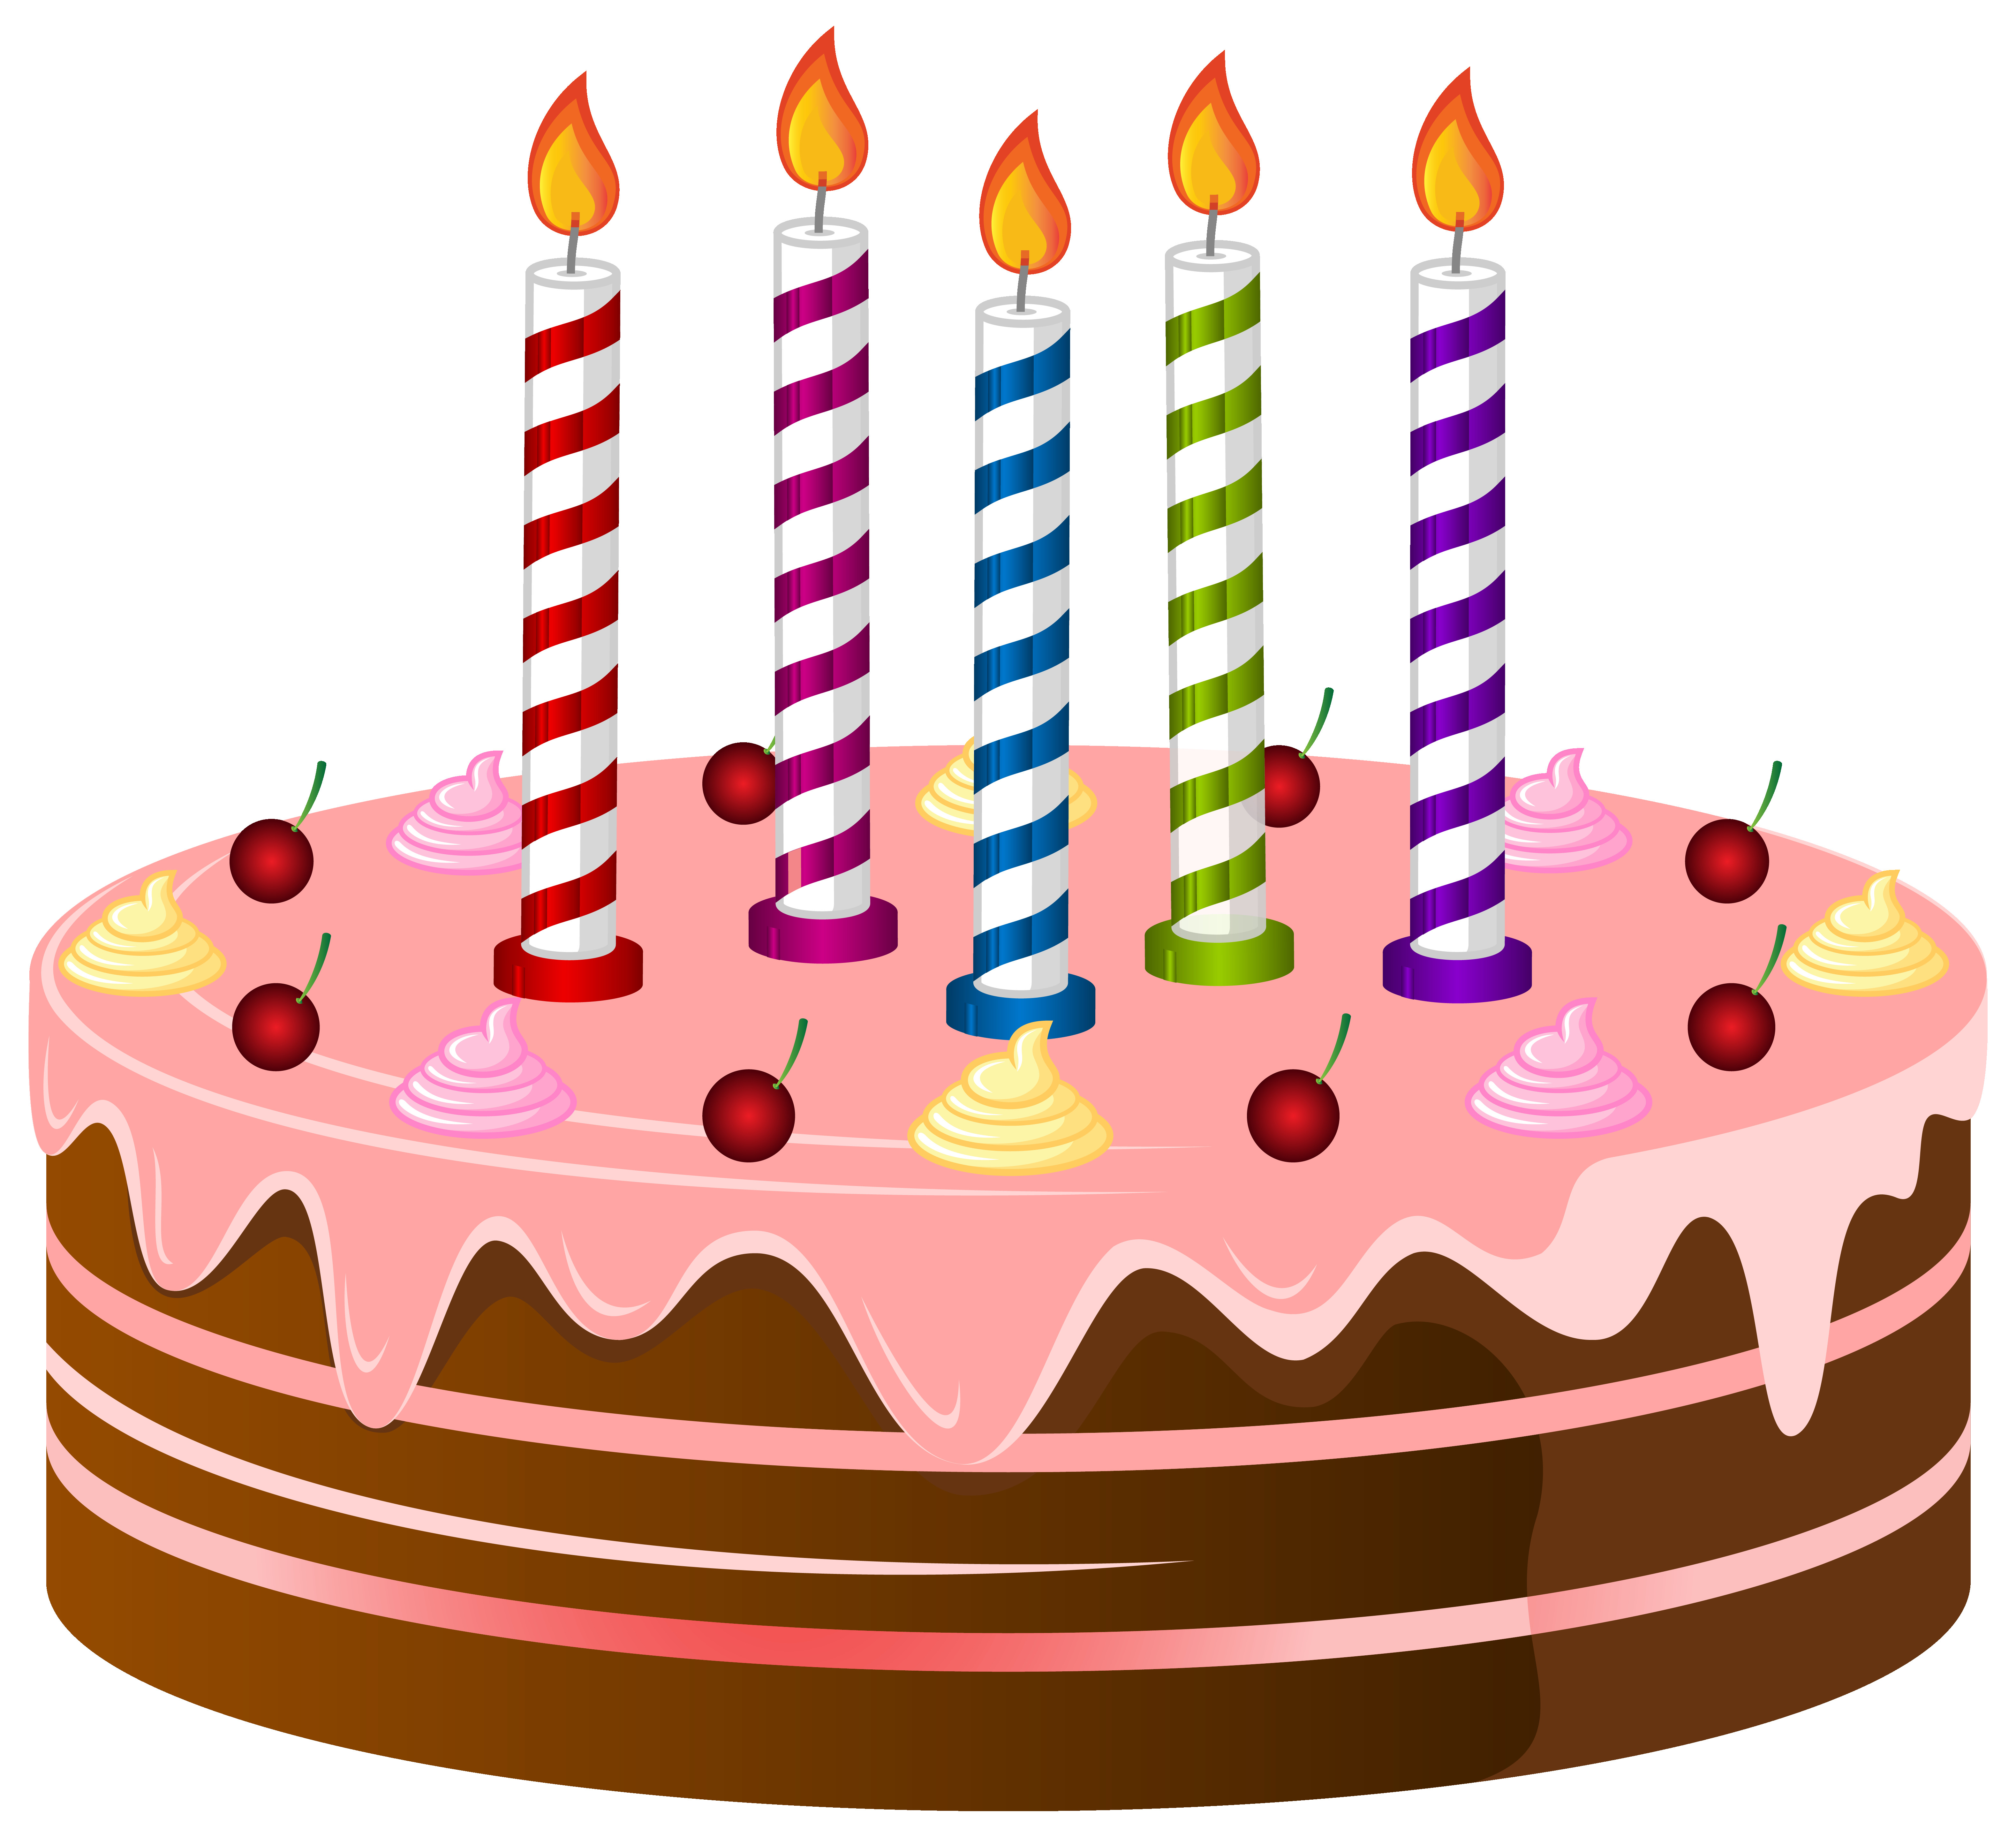 Best ideas about Clip Art Birthday Cake . Save or Pin Funny birthday cake clipart Clipartix Now.